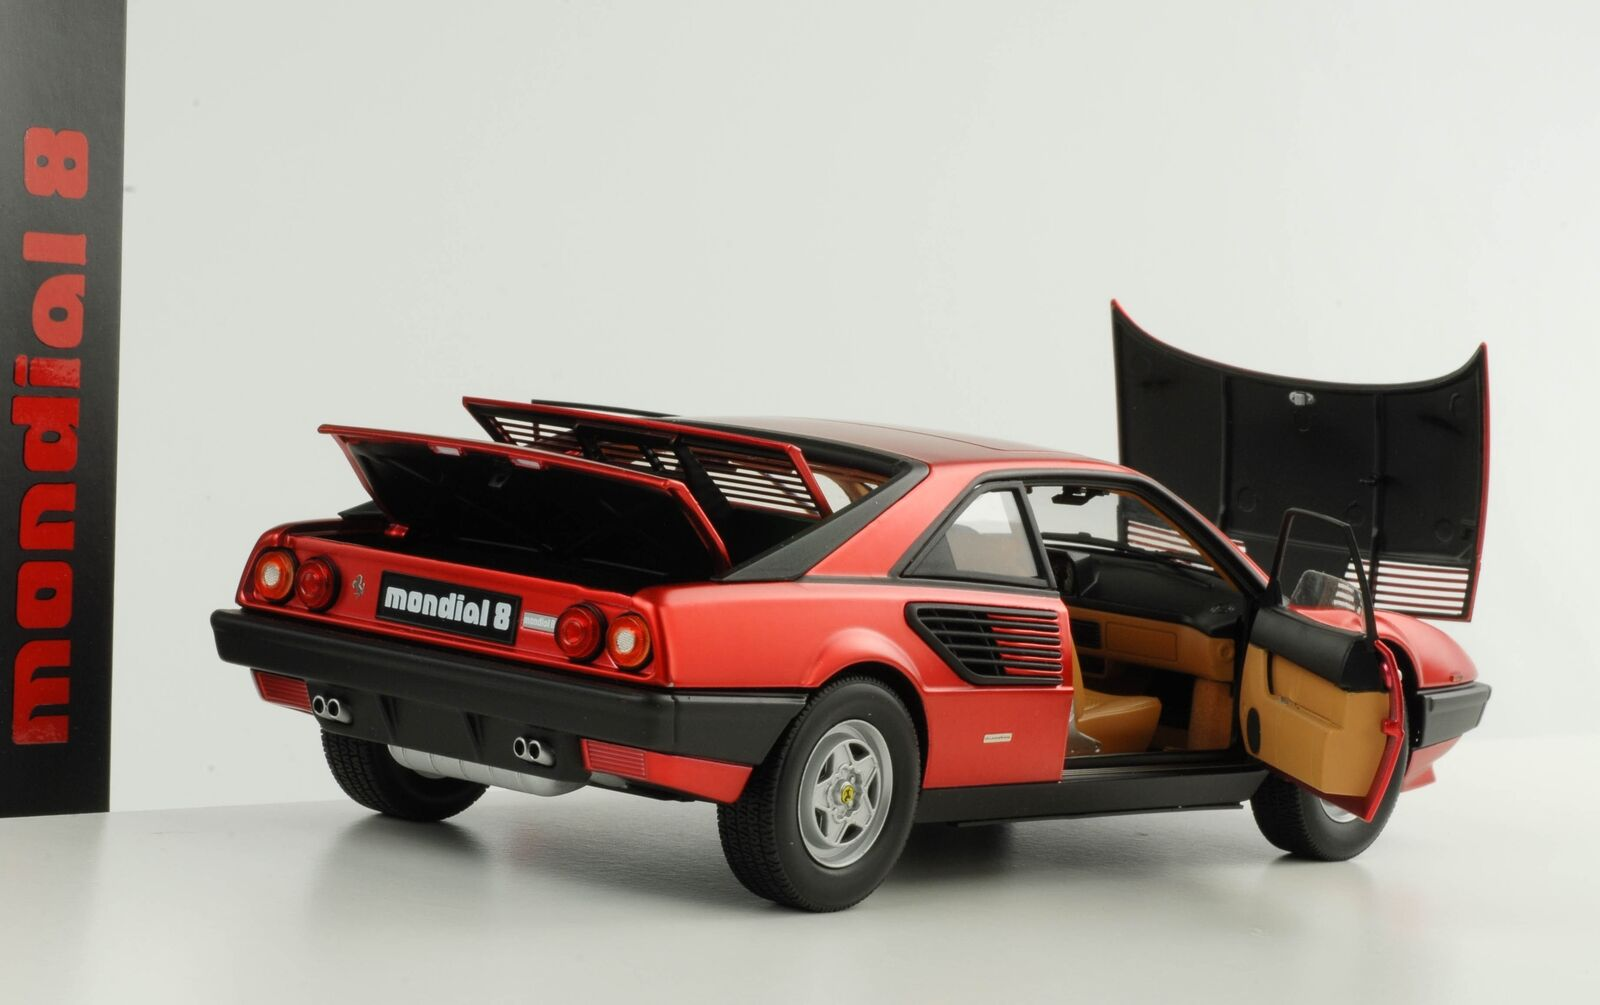 Ferrari Mondial 8 Hot Wheels Elite Serie 60 Aniversario F1 Cherry Rojo 19